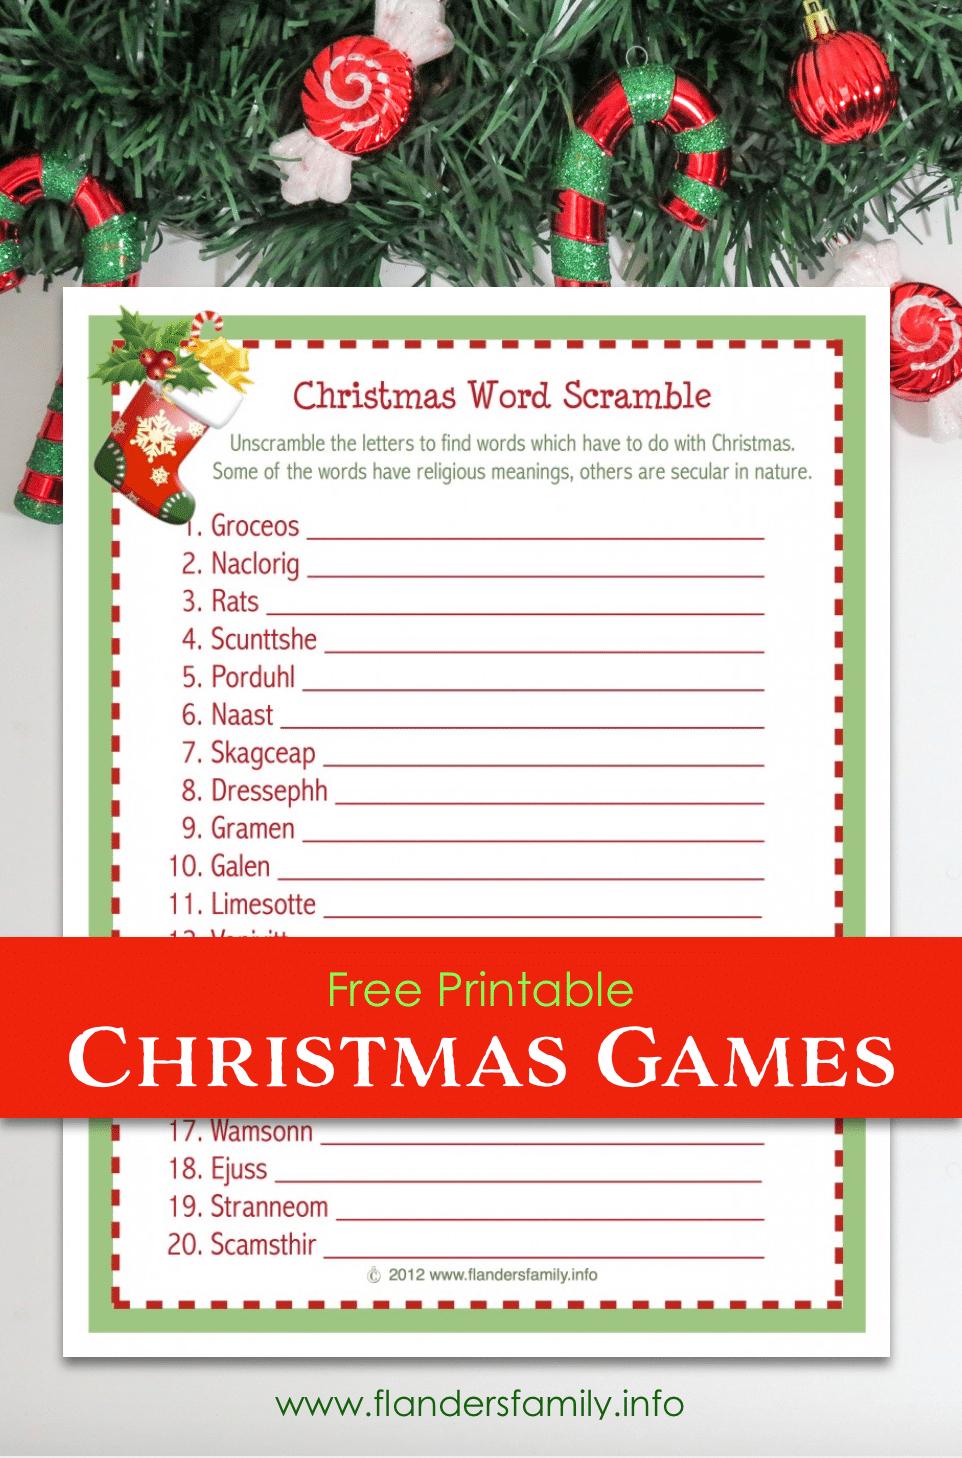 Christmas Word Scramble (Free Printable) - Flanders Family Homelife - Free Printable Religious Christmas Games